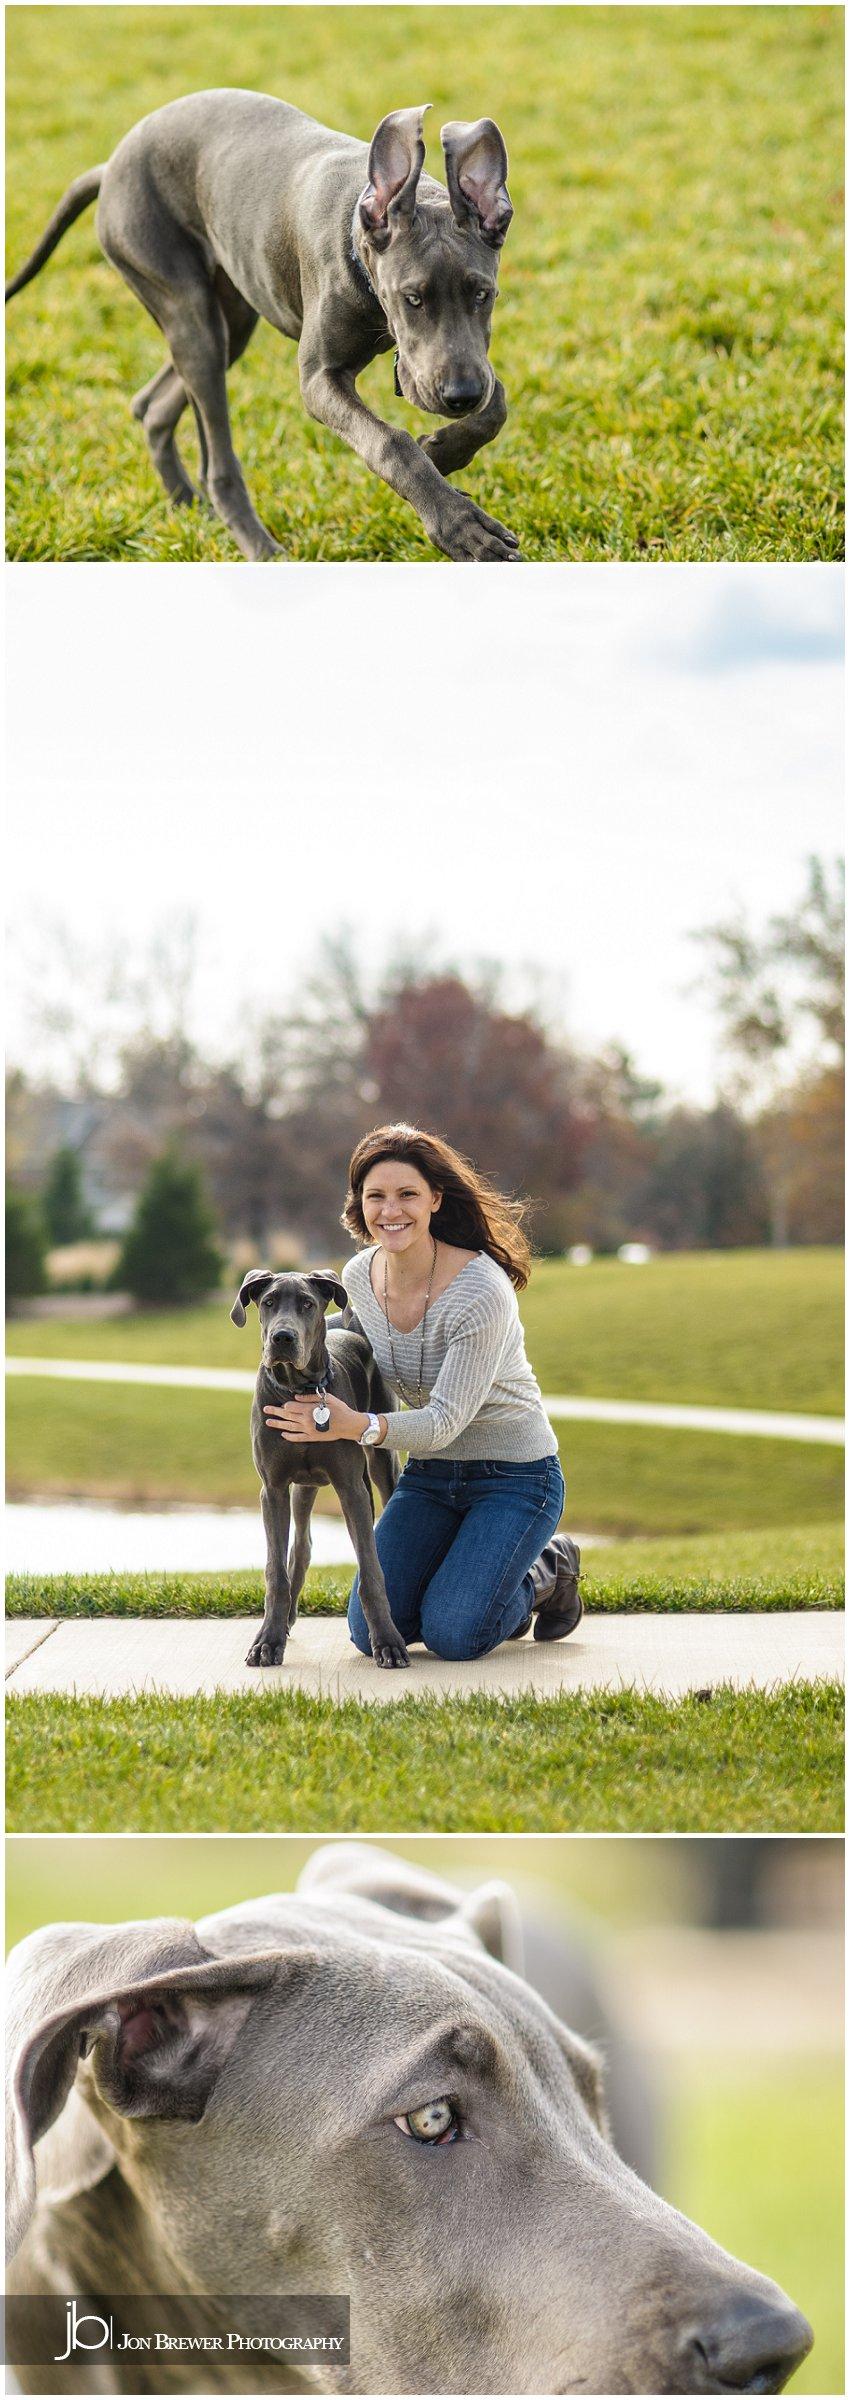 Becky & Luna - A Great Dane Puppy (3)